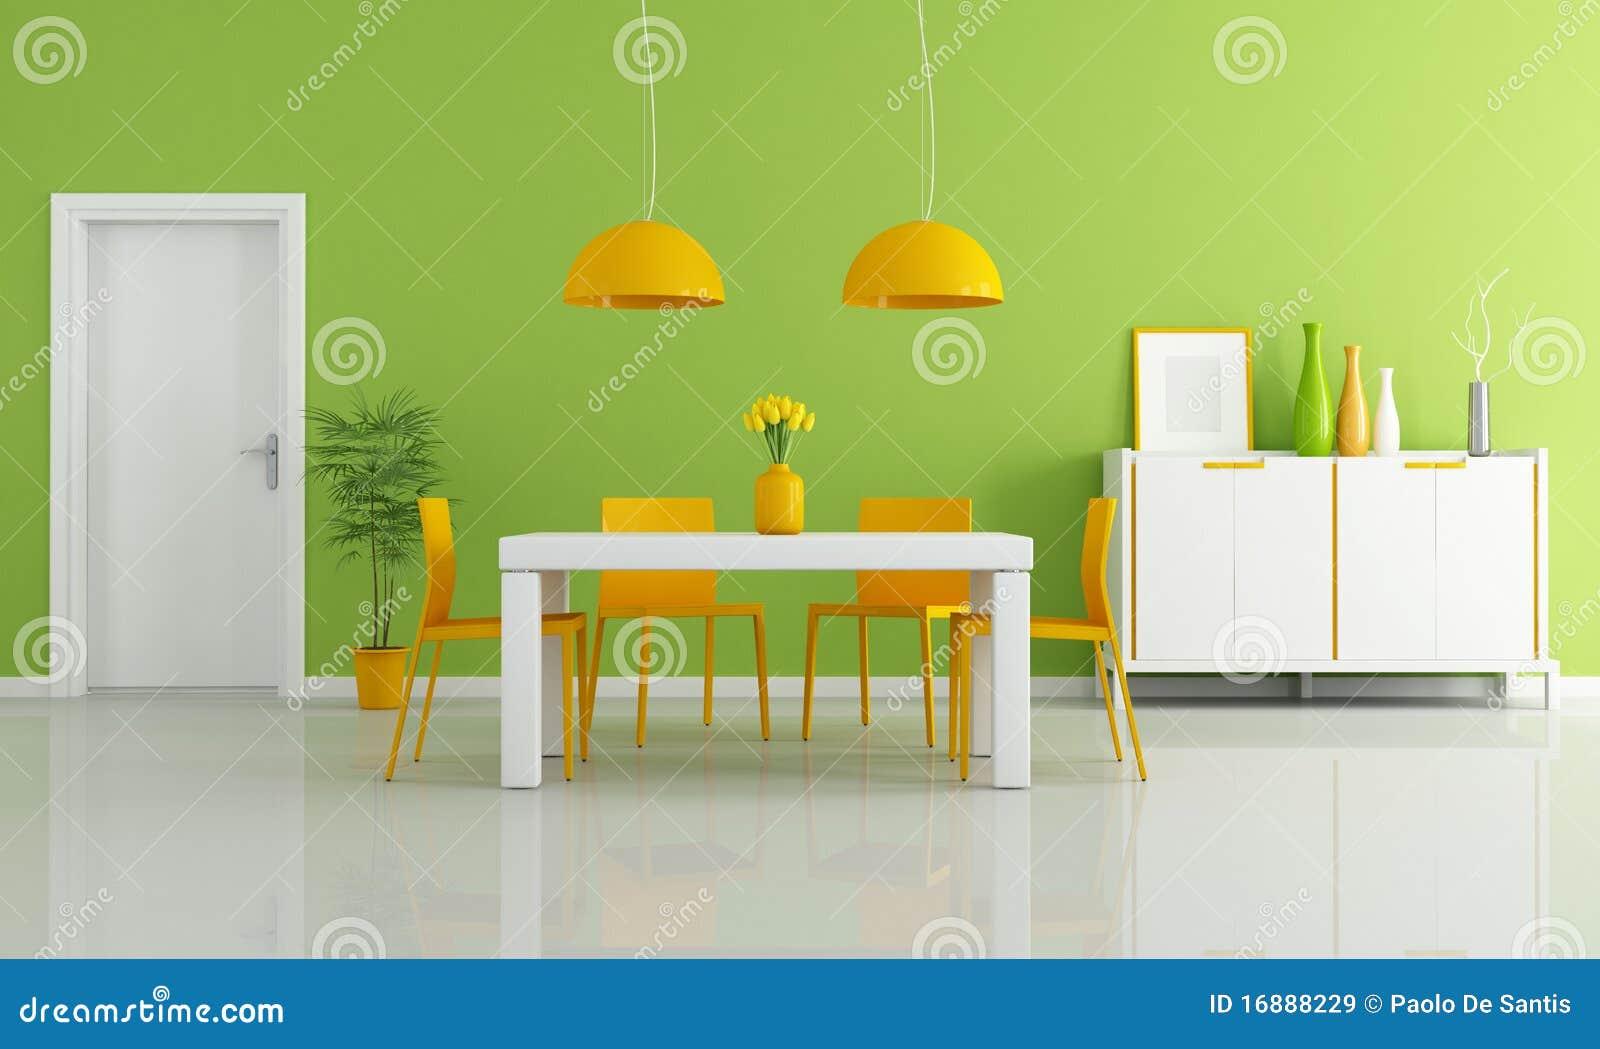 Sala Da Pranzo Moderna Colorata Immagini Stock Libere Da Diritti  #BF8A0C 1300 870 Sala Da Pranzo Colorata